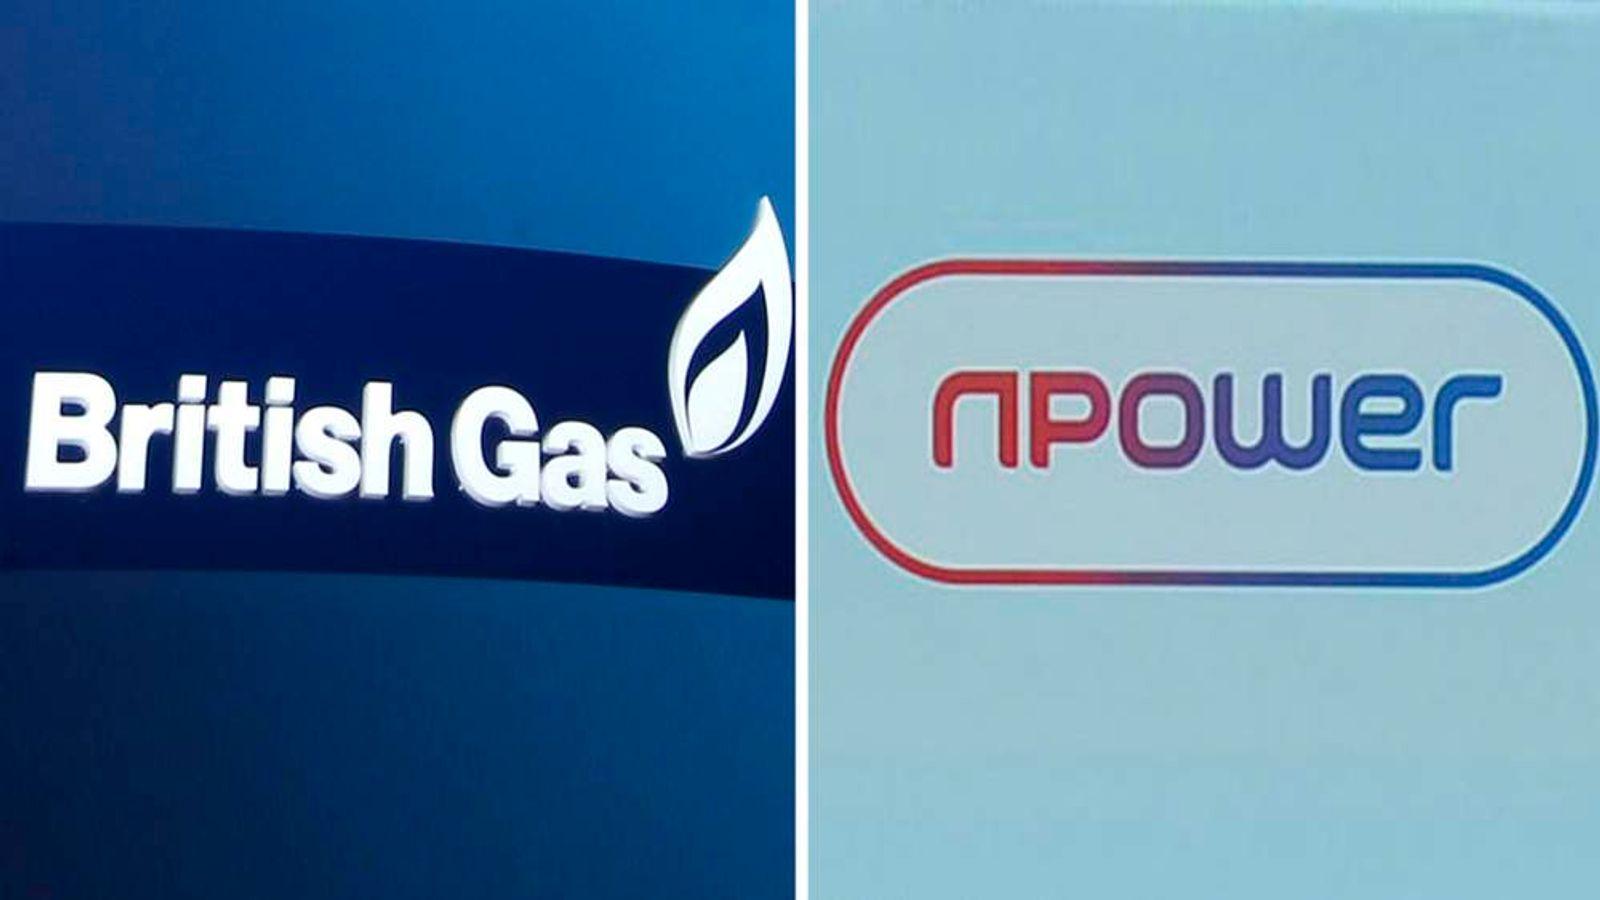 British Gas and Npower logos